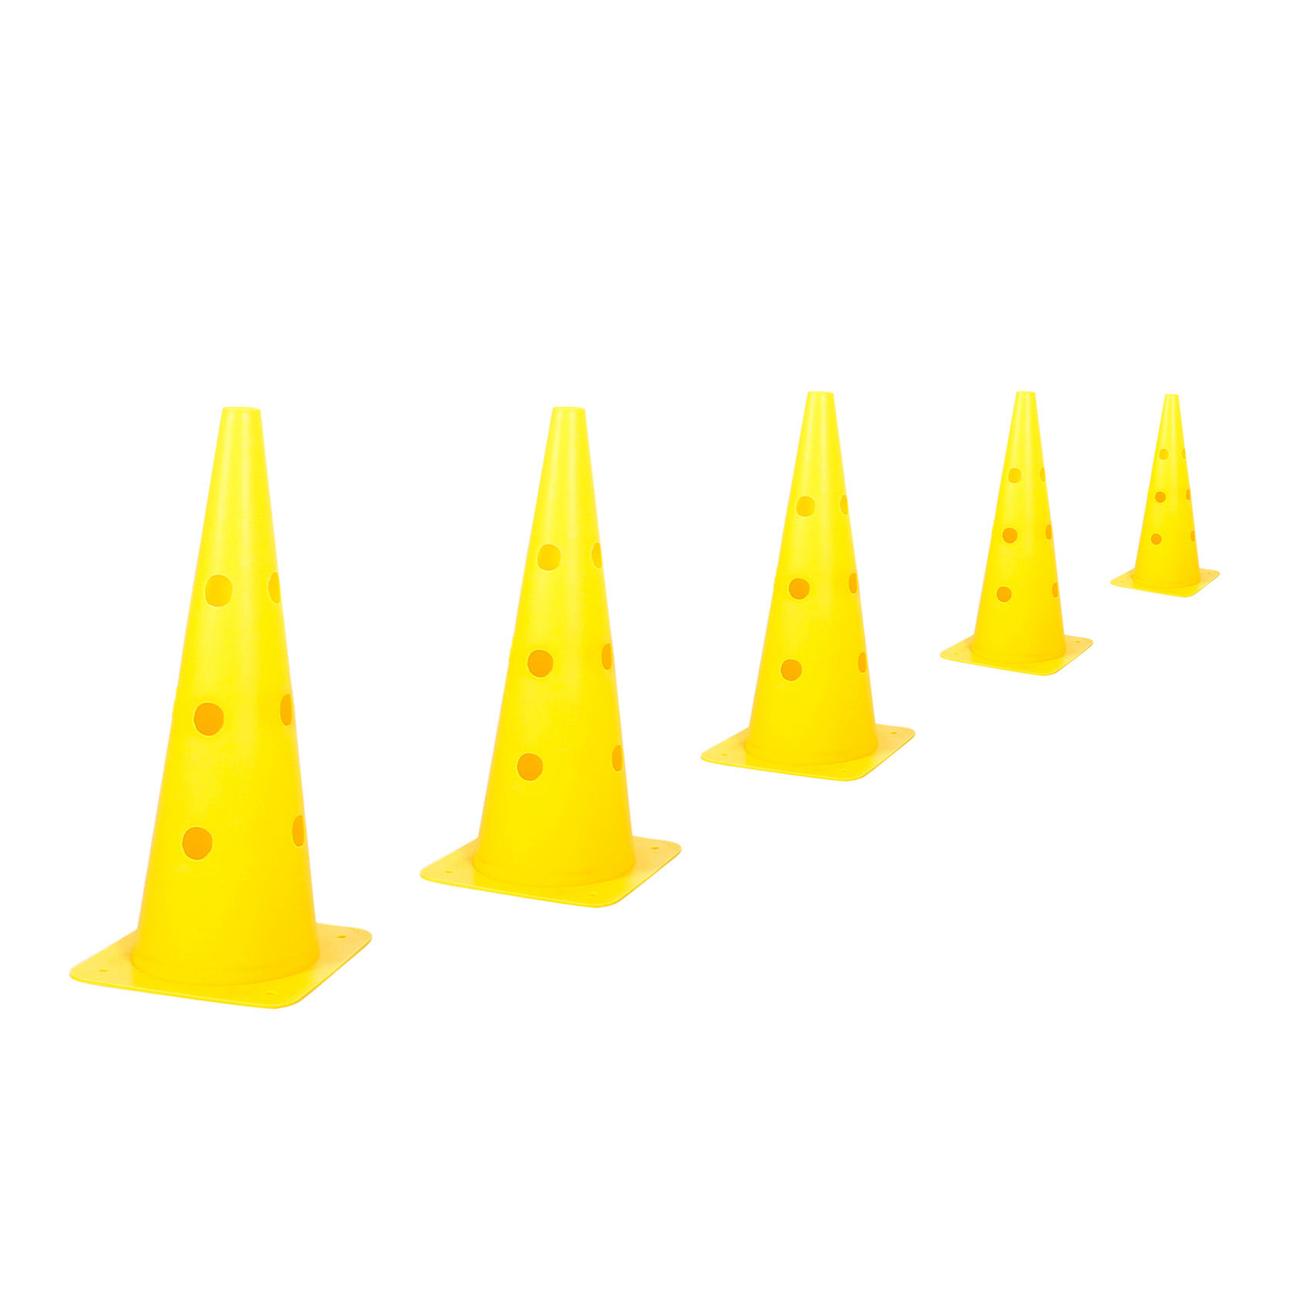 Kerbl Agility Pylonen-Hürden Set für Hunde, Bild 5